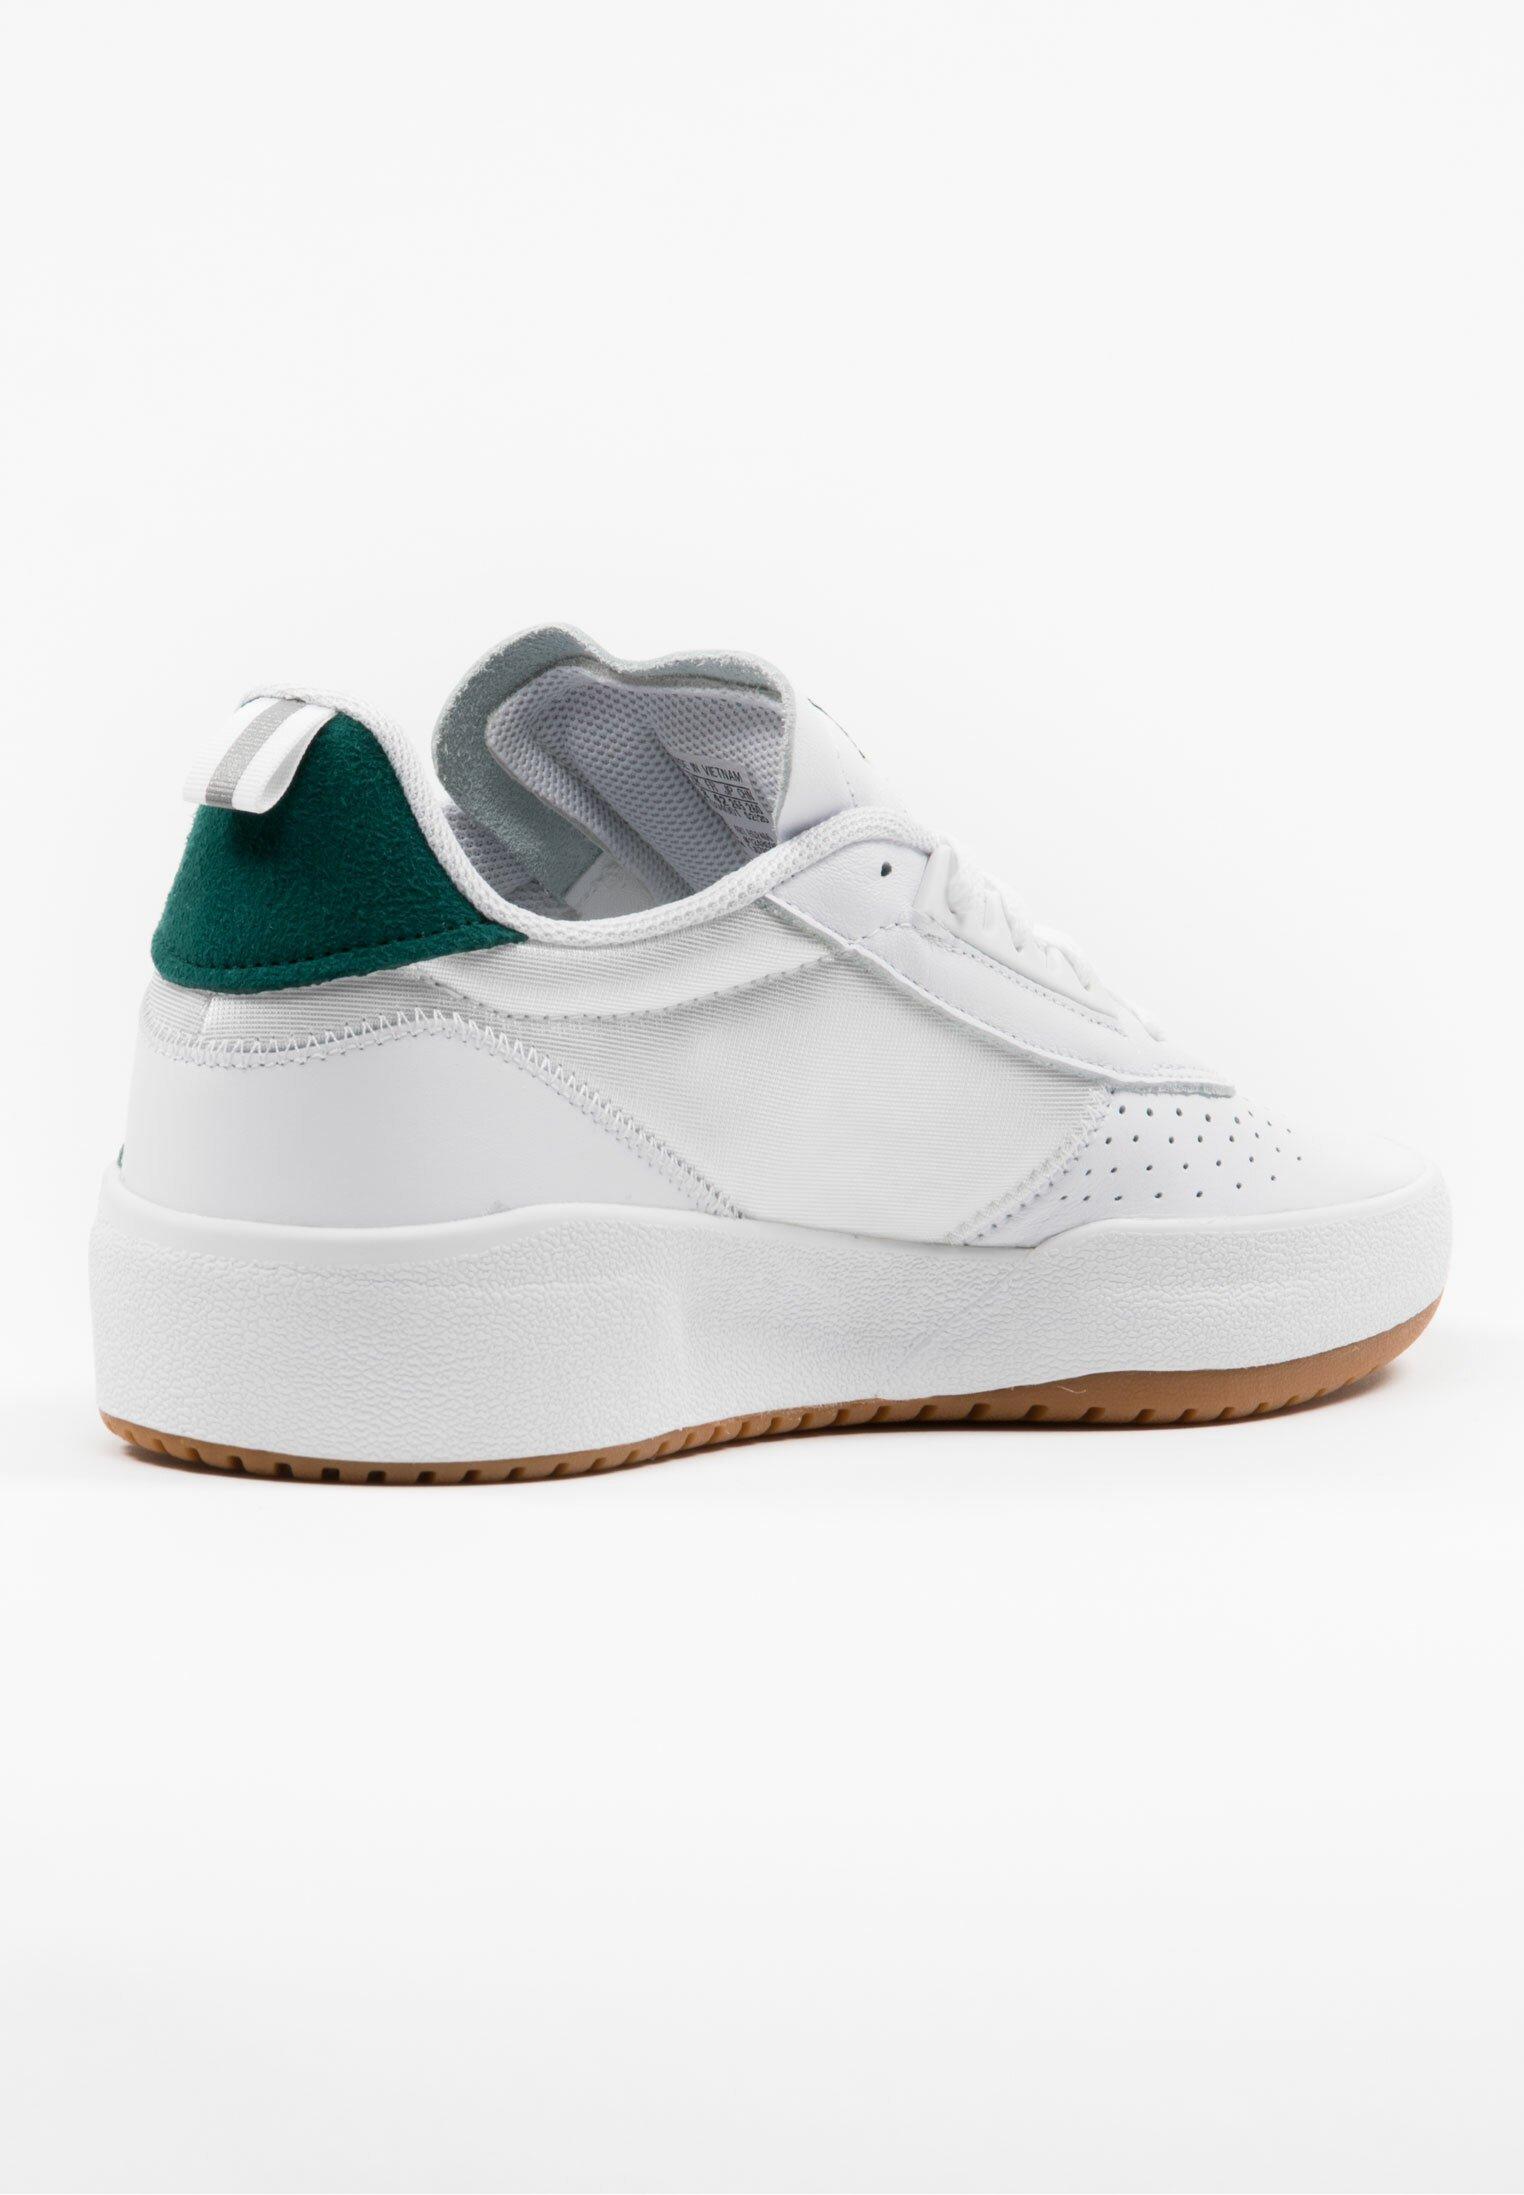 adidas Originals LIBERTY CUP - Sneaker low - cloud white / green / brown/grün - Herrenschuhe wFoLU